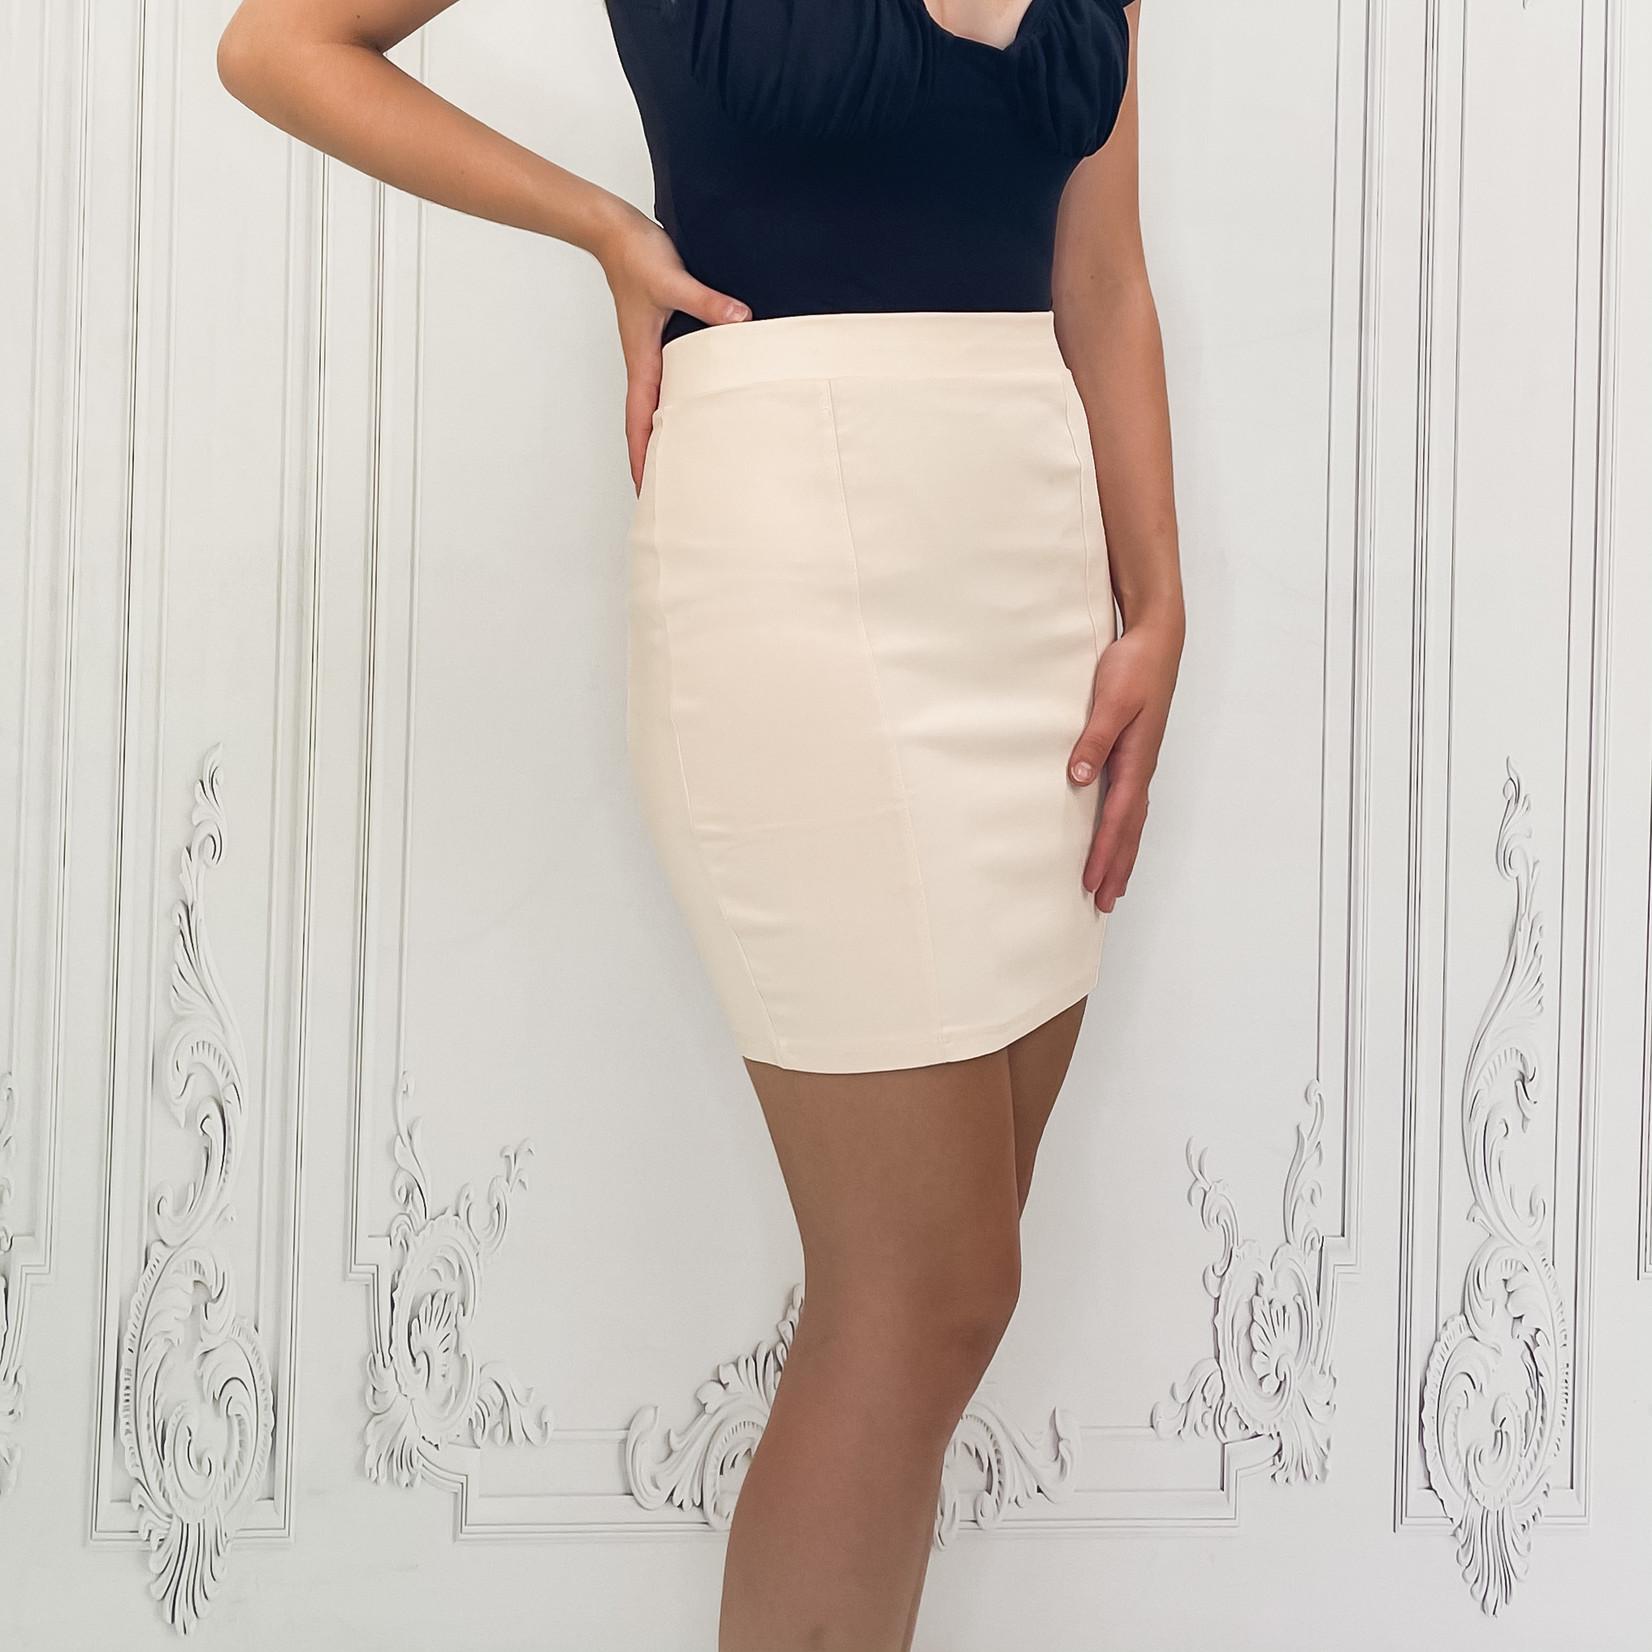 Idelle stretch denim skirt